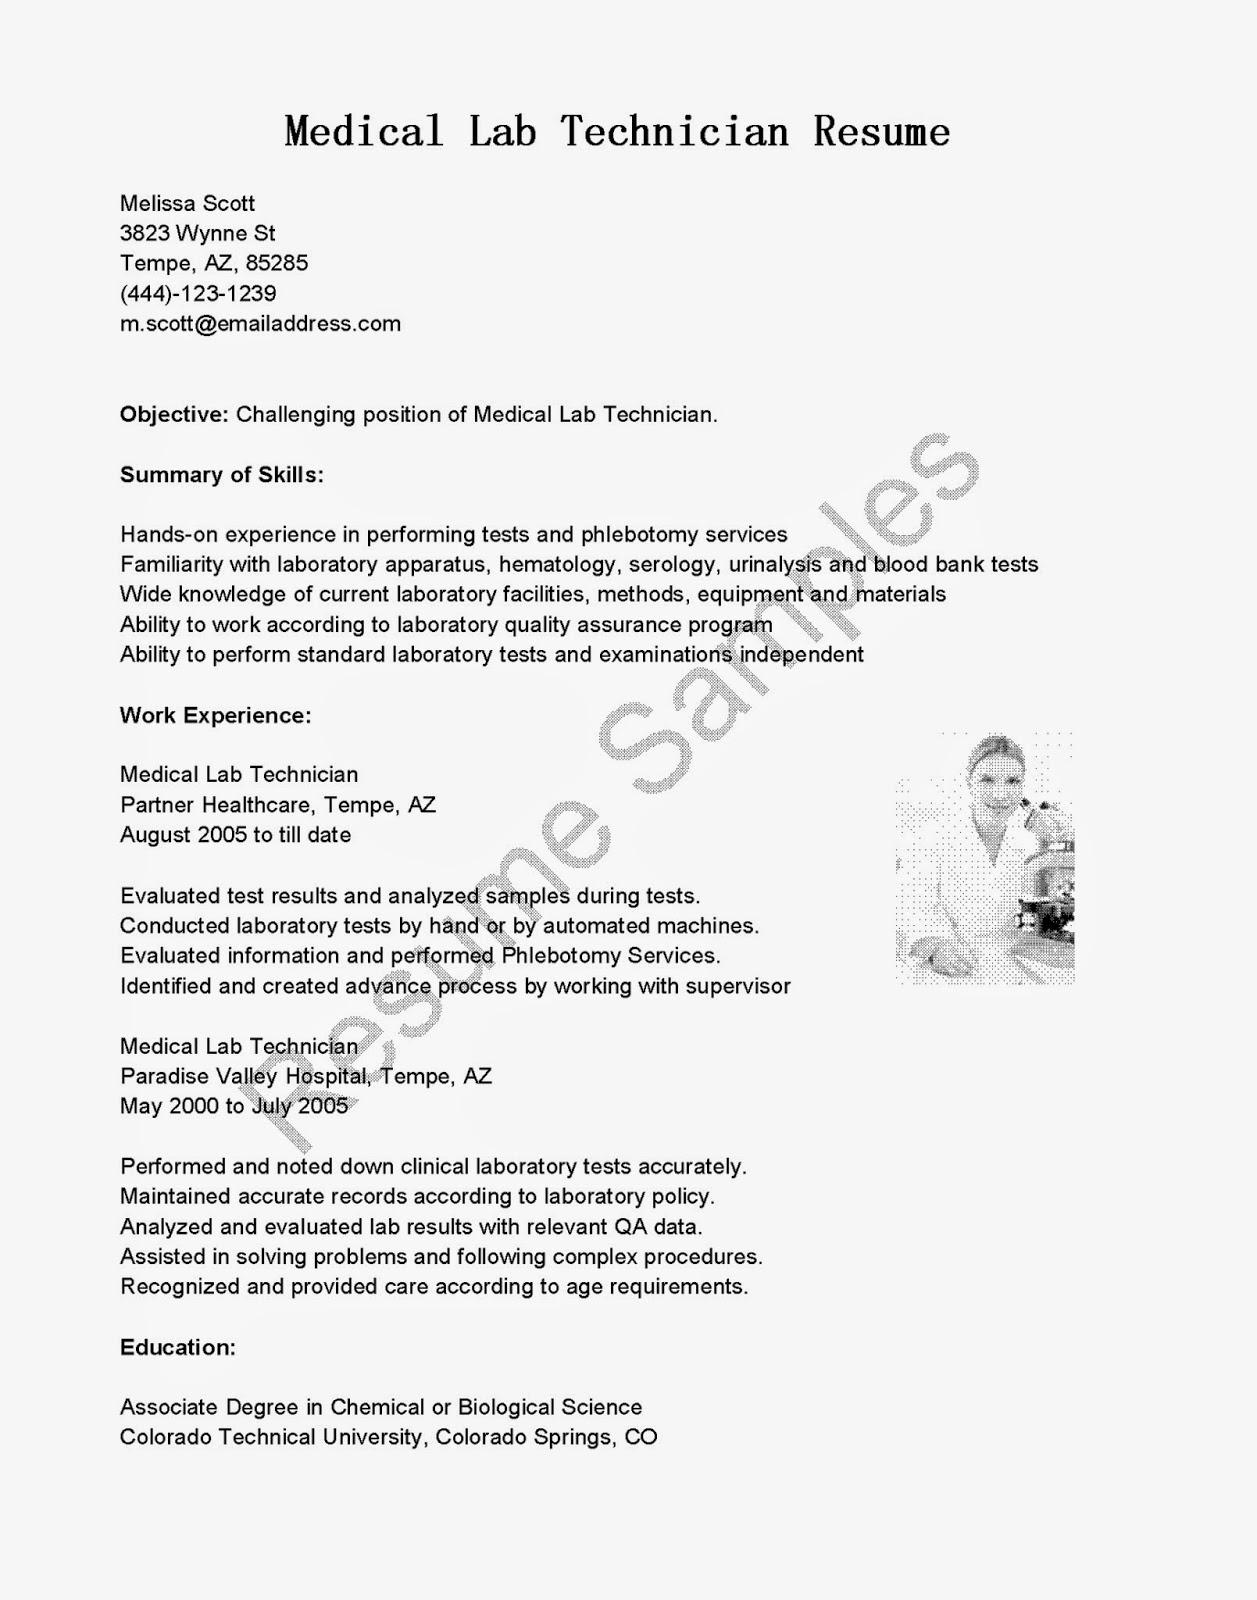 Resume Samples Medical Lab Technician Sample